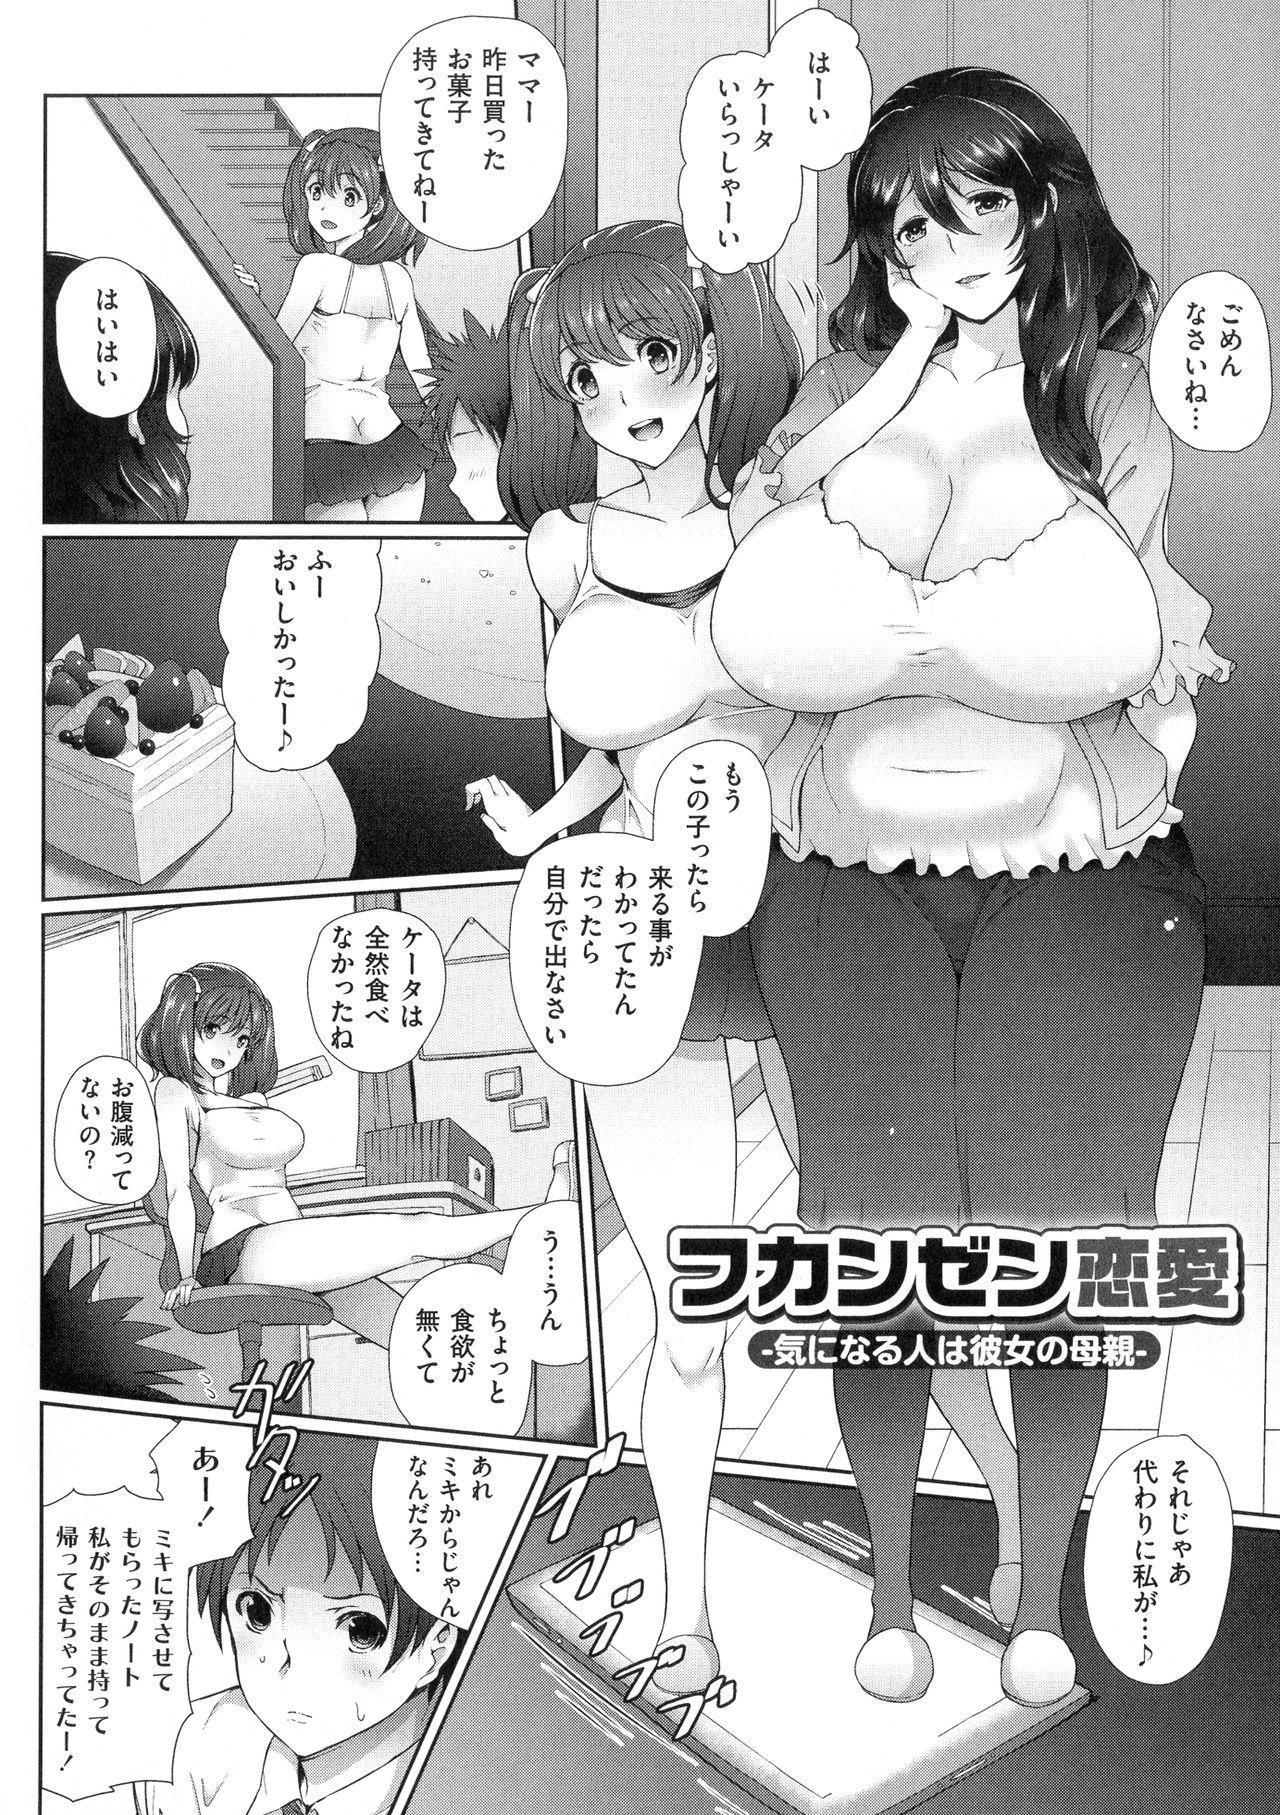 Juku Mesu - Erotic Mature Women 192